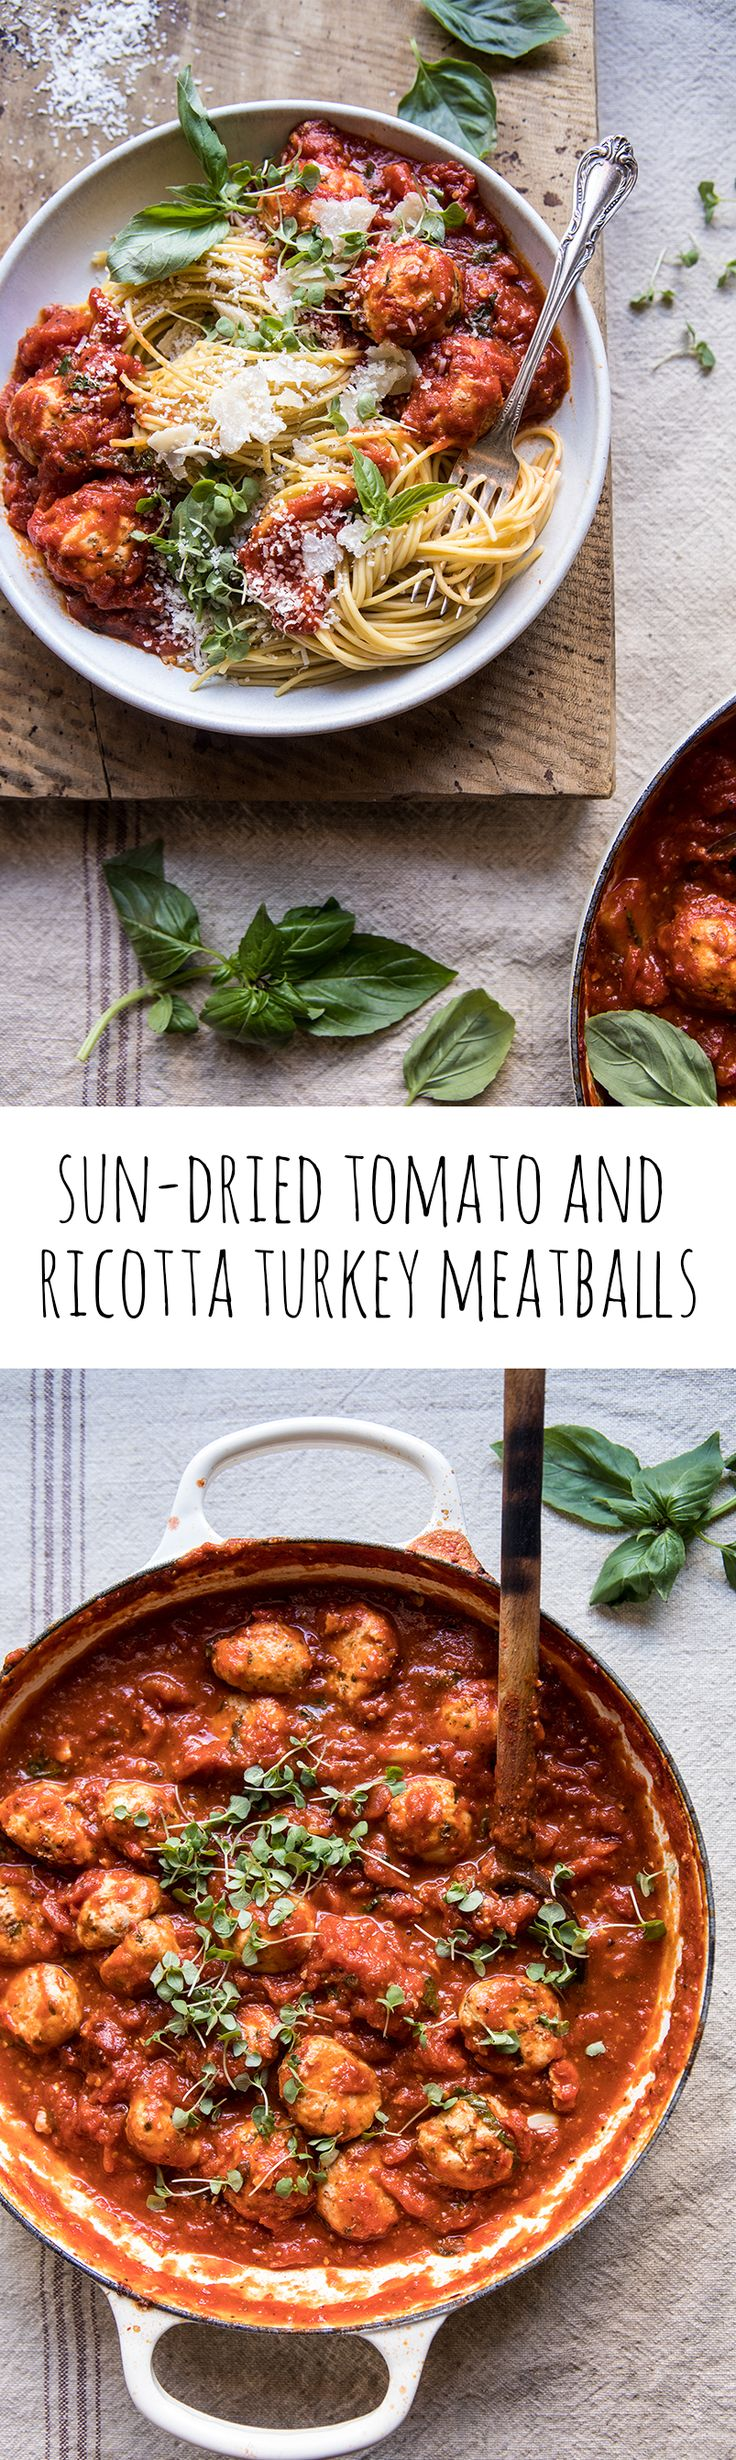 Sun-Dried Tomato and Ricotta Turkey Meatballs | halfbakedharvest.com #pasta #Italian #easy #healthy